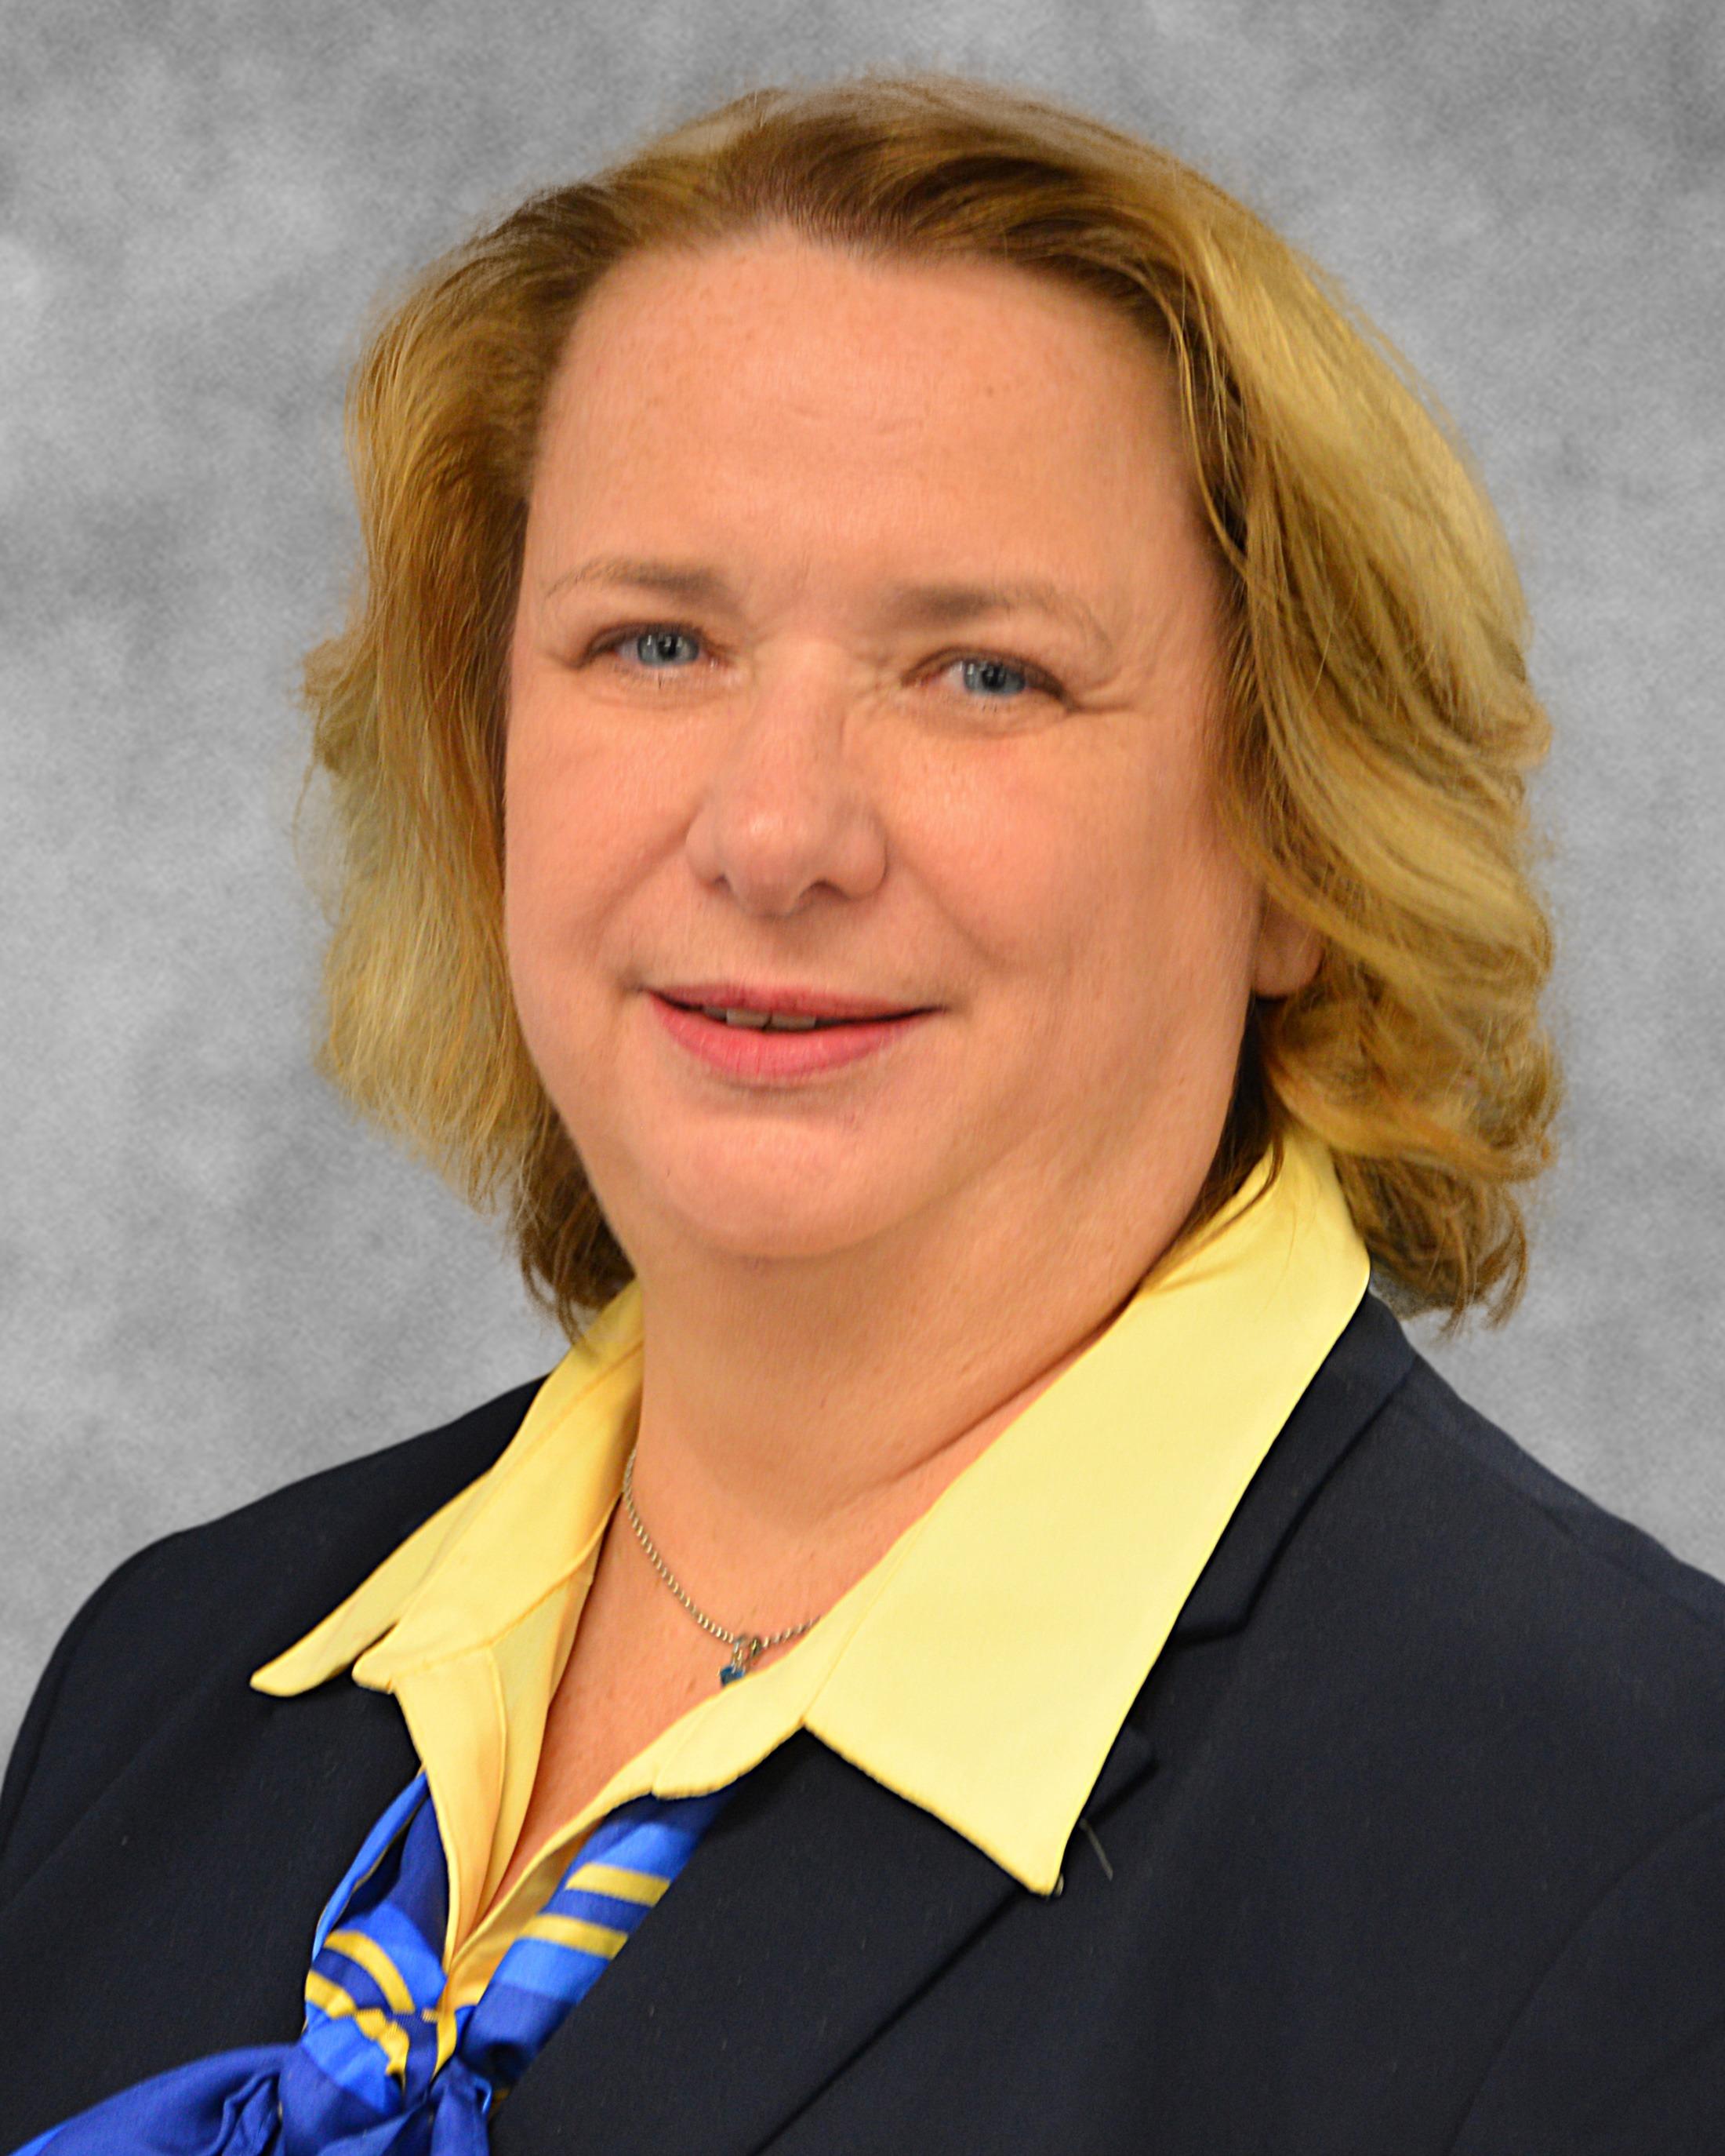 Jill Nussel - International Student Coordinator